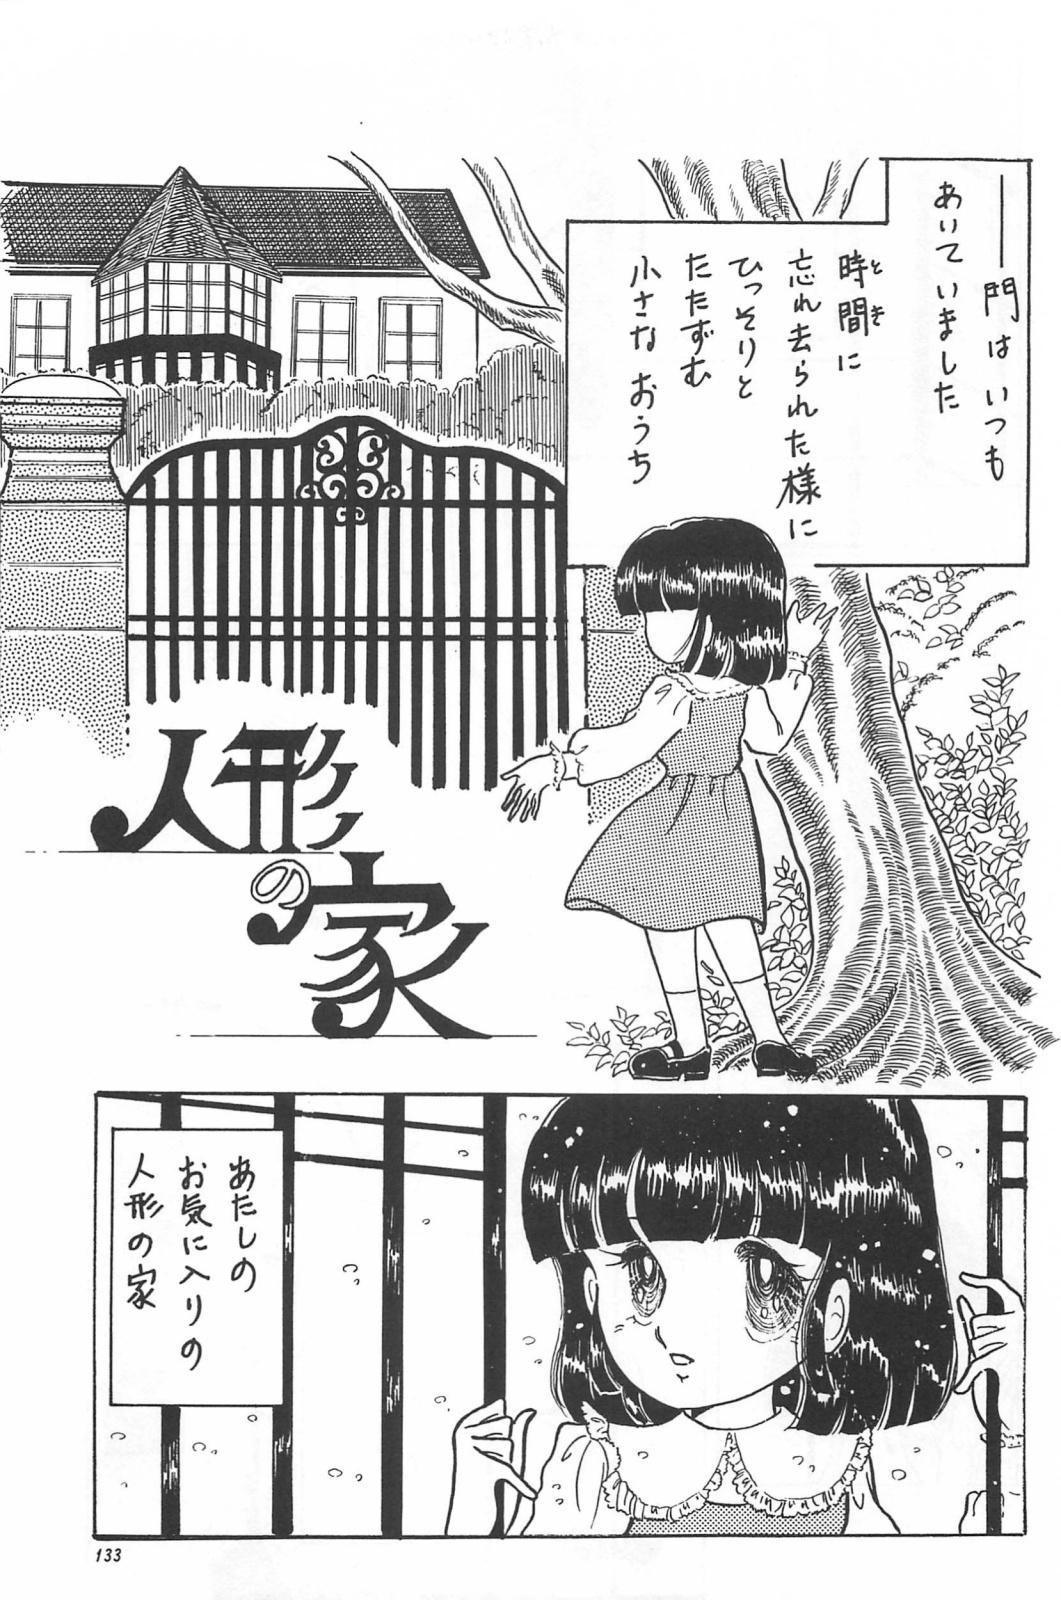 bishoujo syndrome 134